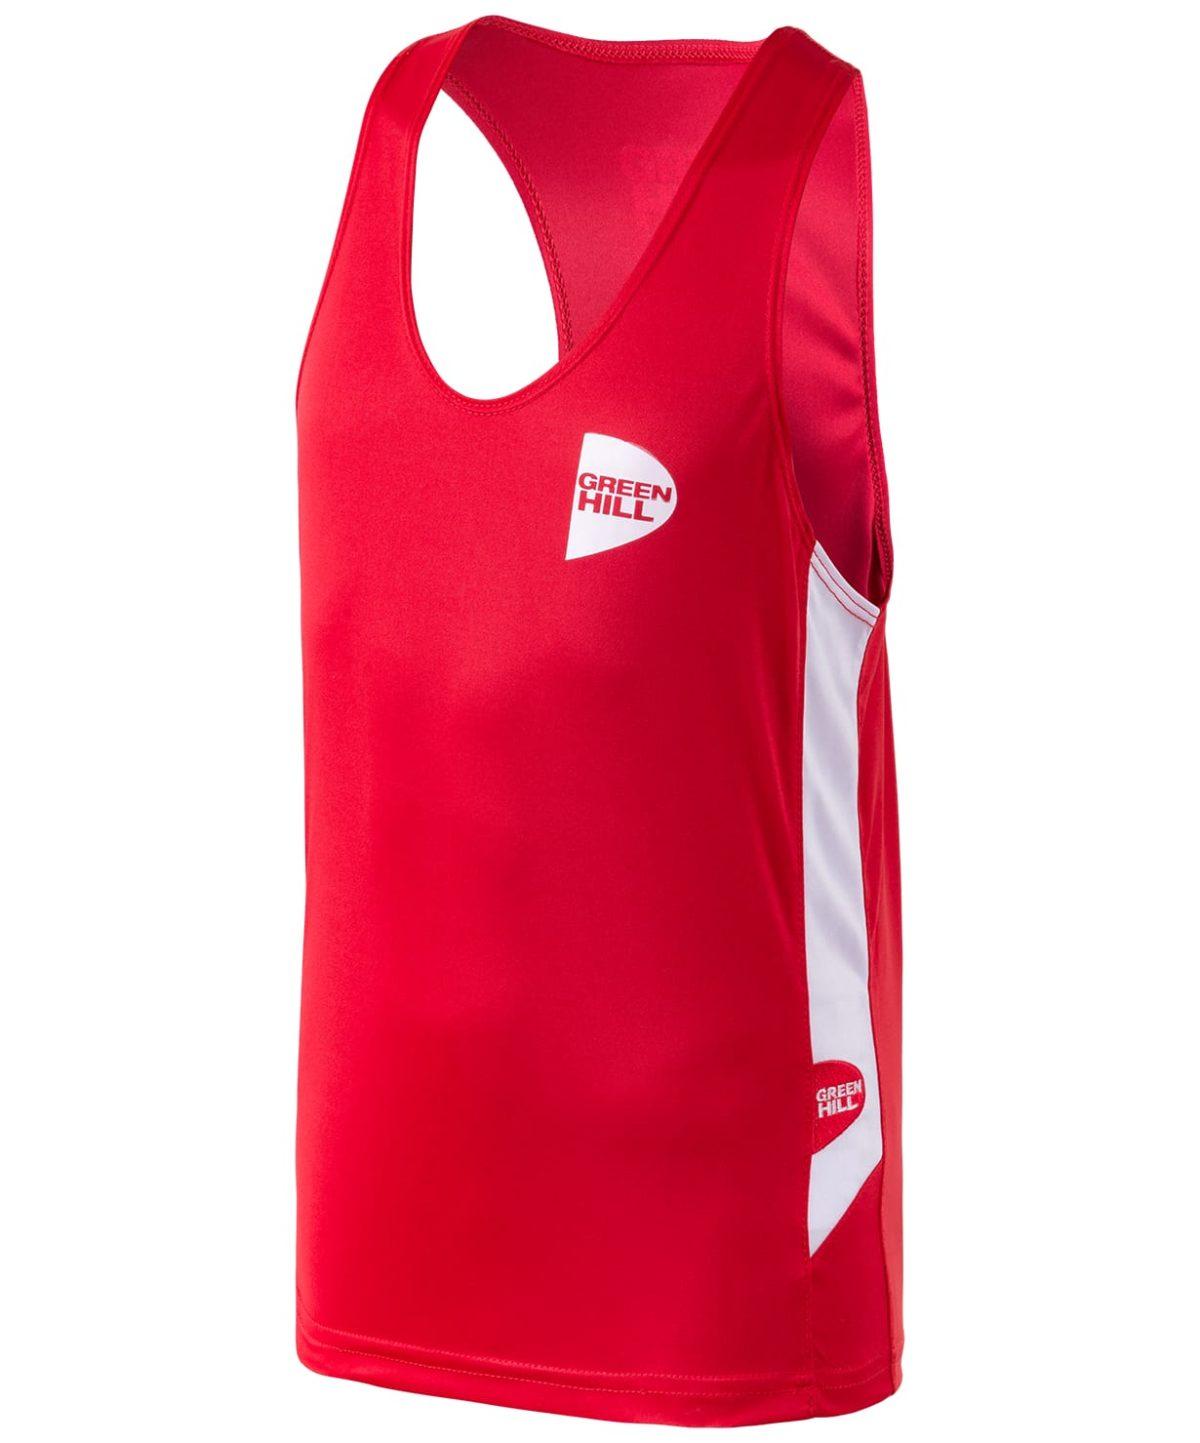 GREEN HILL Interlock Форма для бокса  BSI-3805: красный - 3